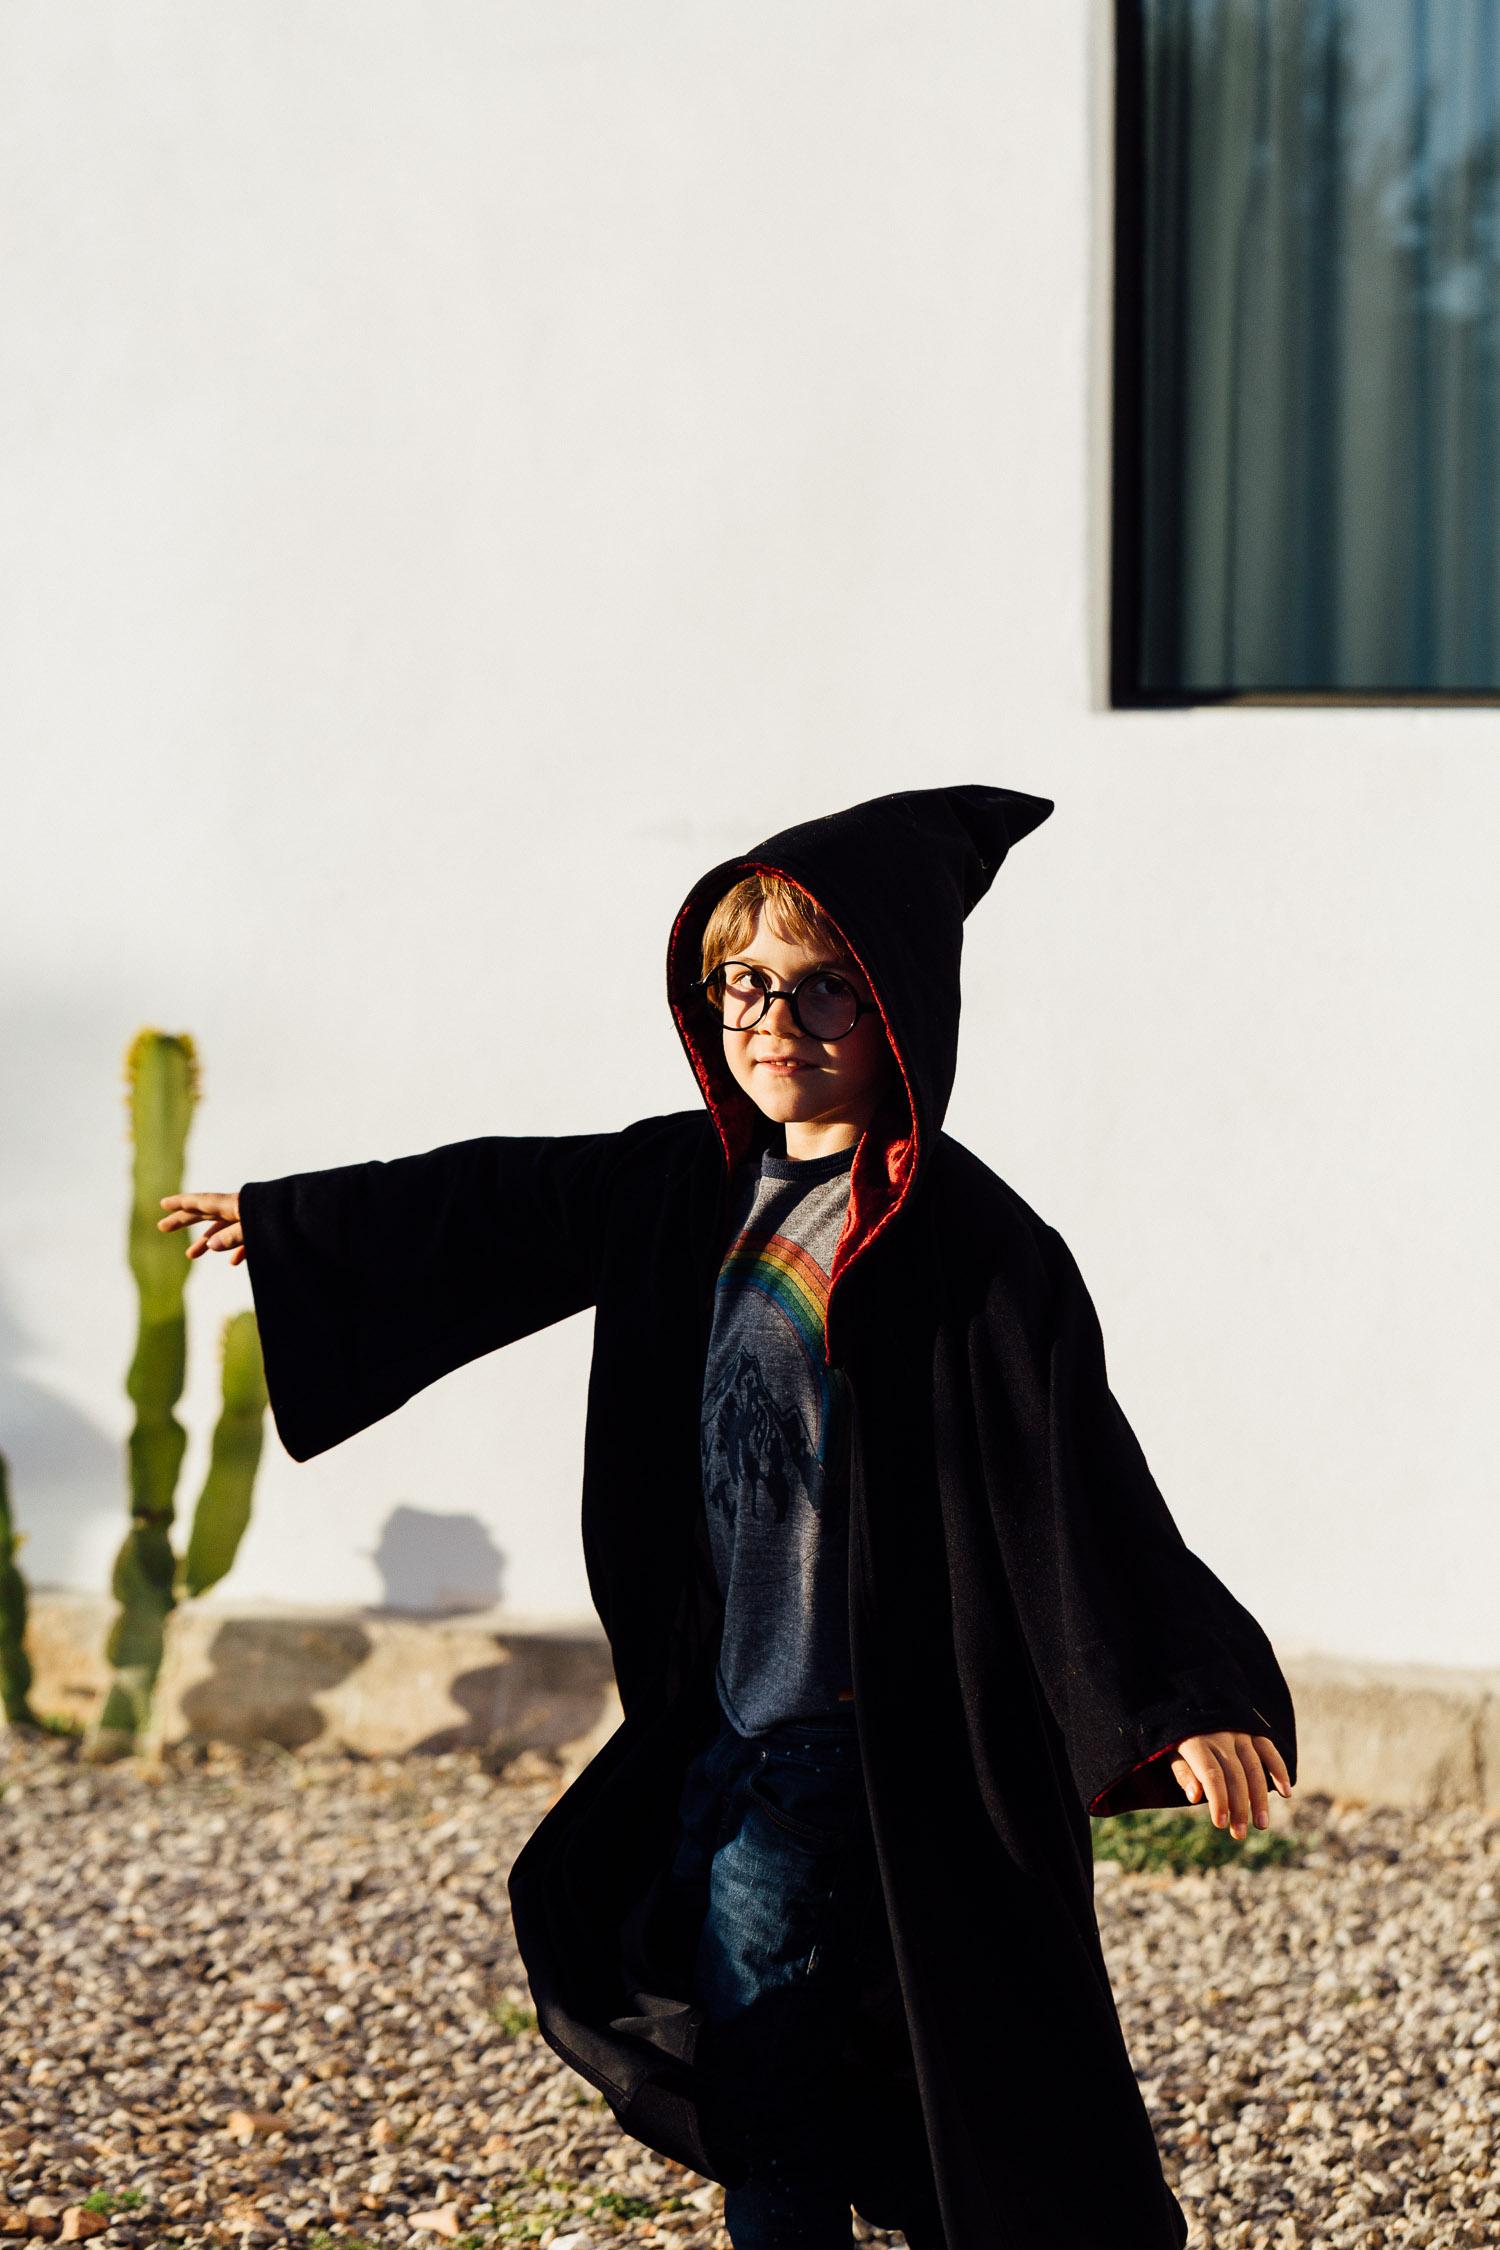 Onderwijs_op_Ibiza_Selina_van_Hulzen_photography_by_On_a_hazy_morning067.jpg